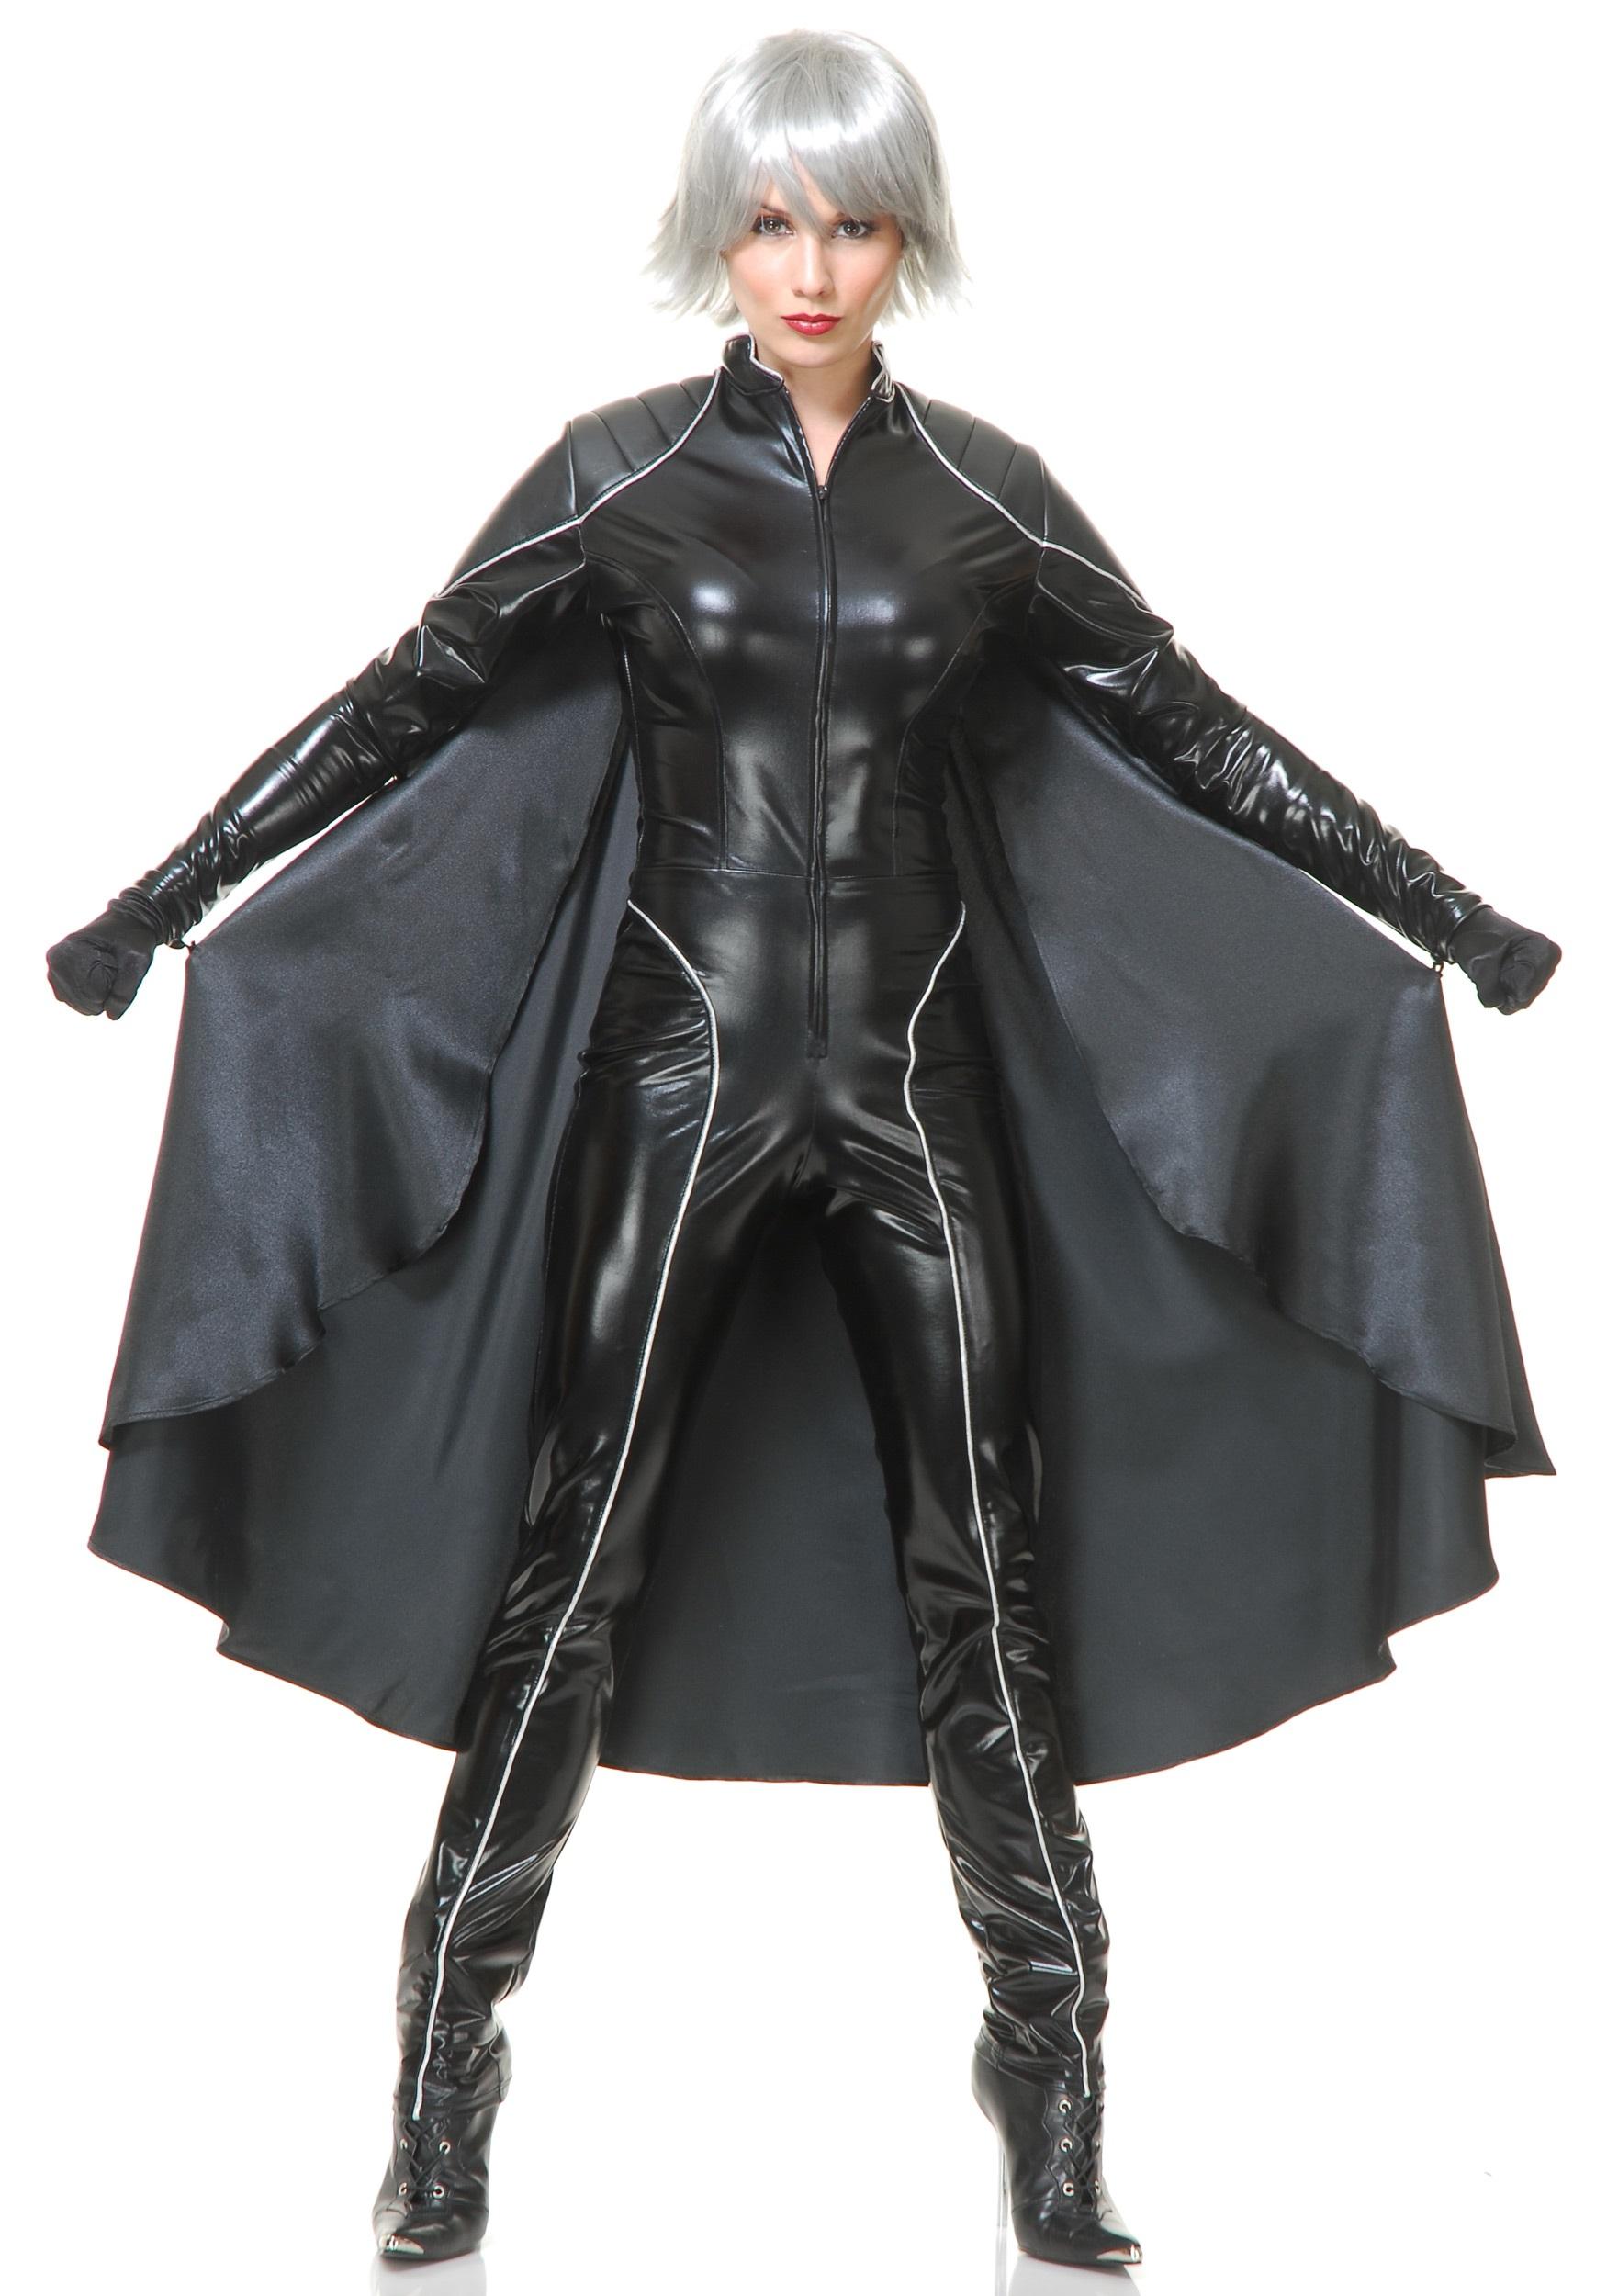 Women's Thunder Superhero Costume | Black Jumpsuit Women W/ Cape